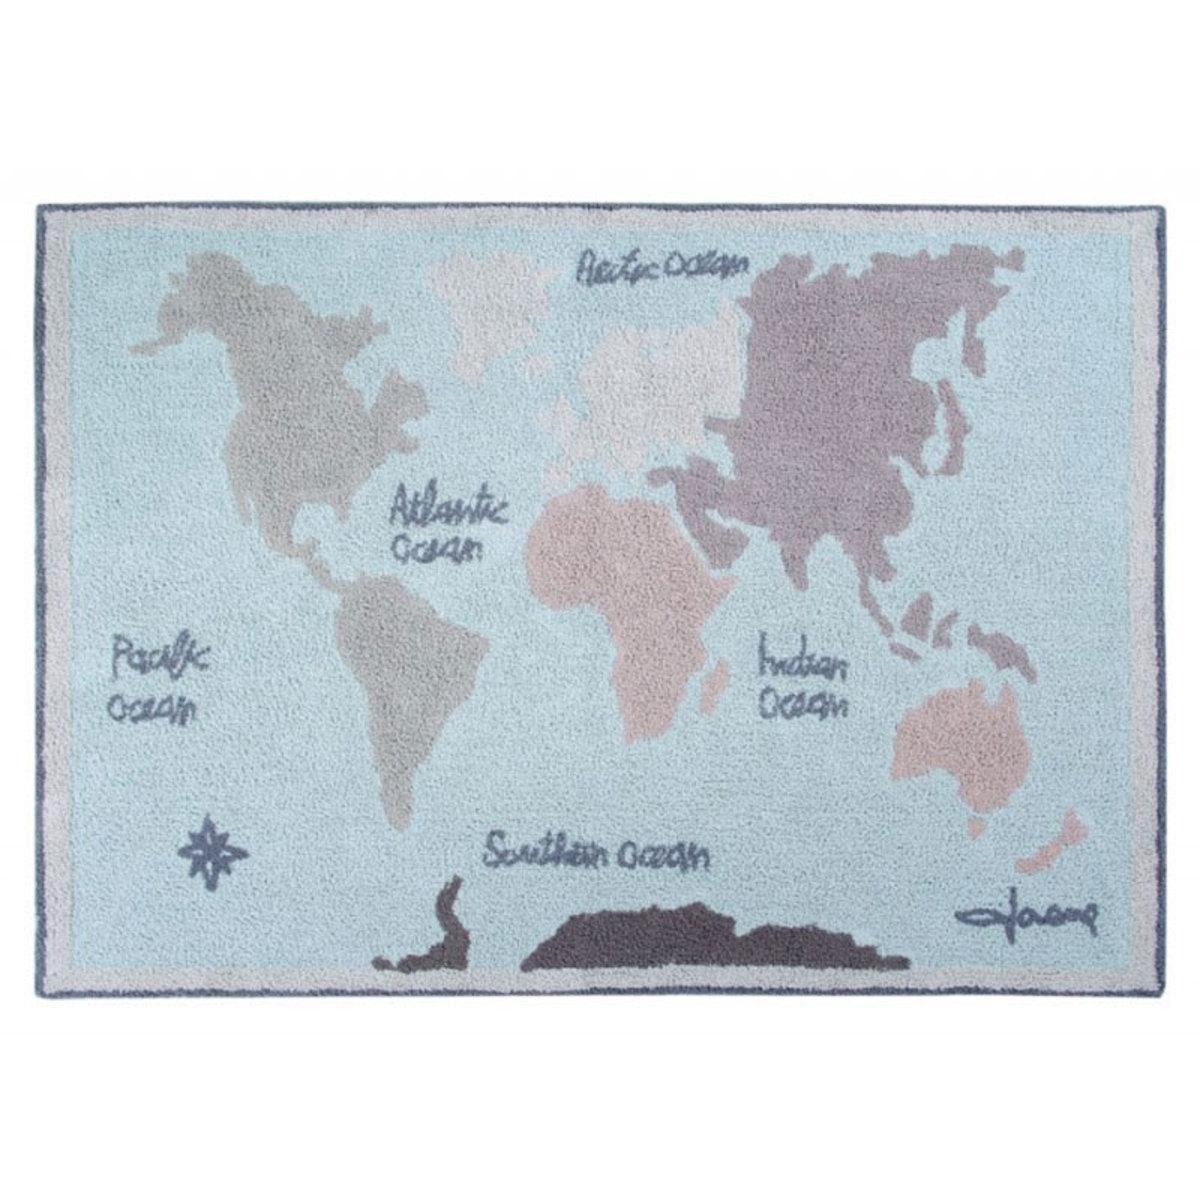 Tapis Tapis Vintage Map - 140 x 200 cm Tapis Vintage Map - 140 x 200 cm